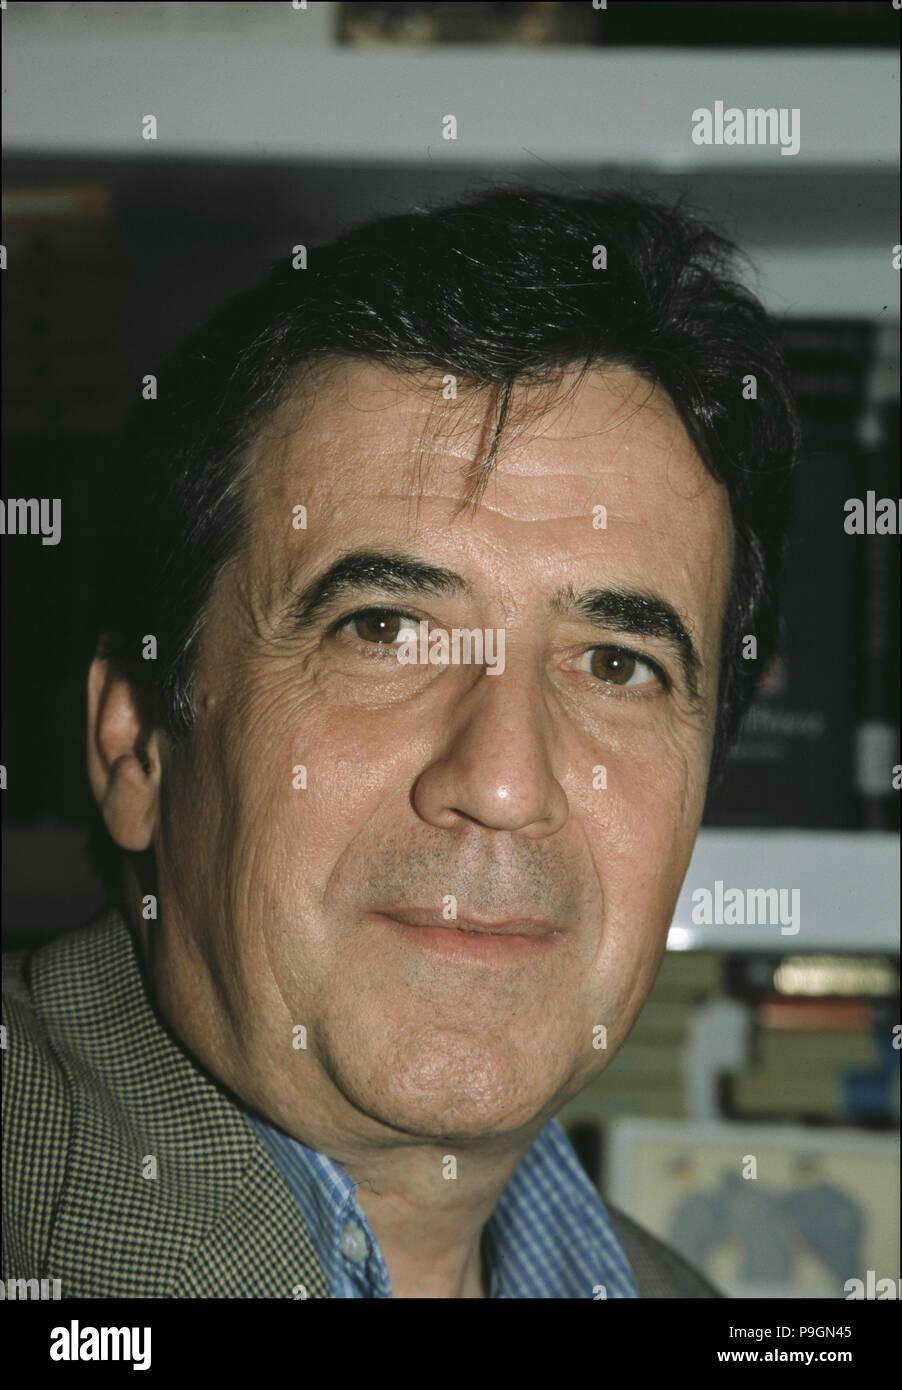 Luis Landero (1948-), Spanish writer. - Stock Image